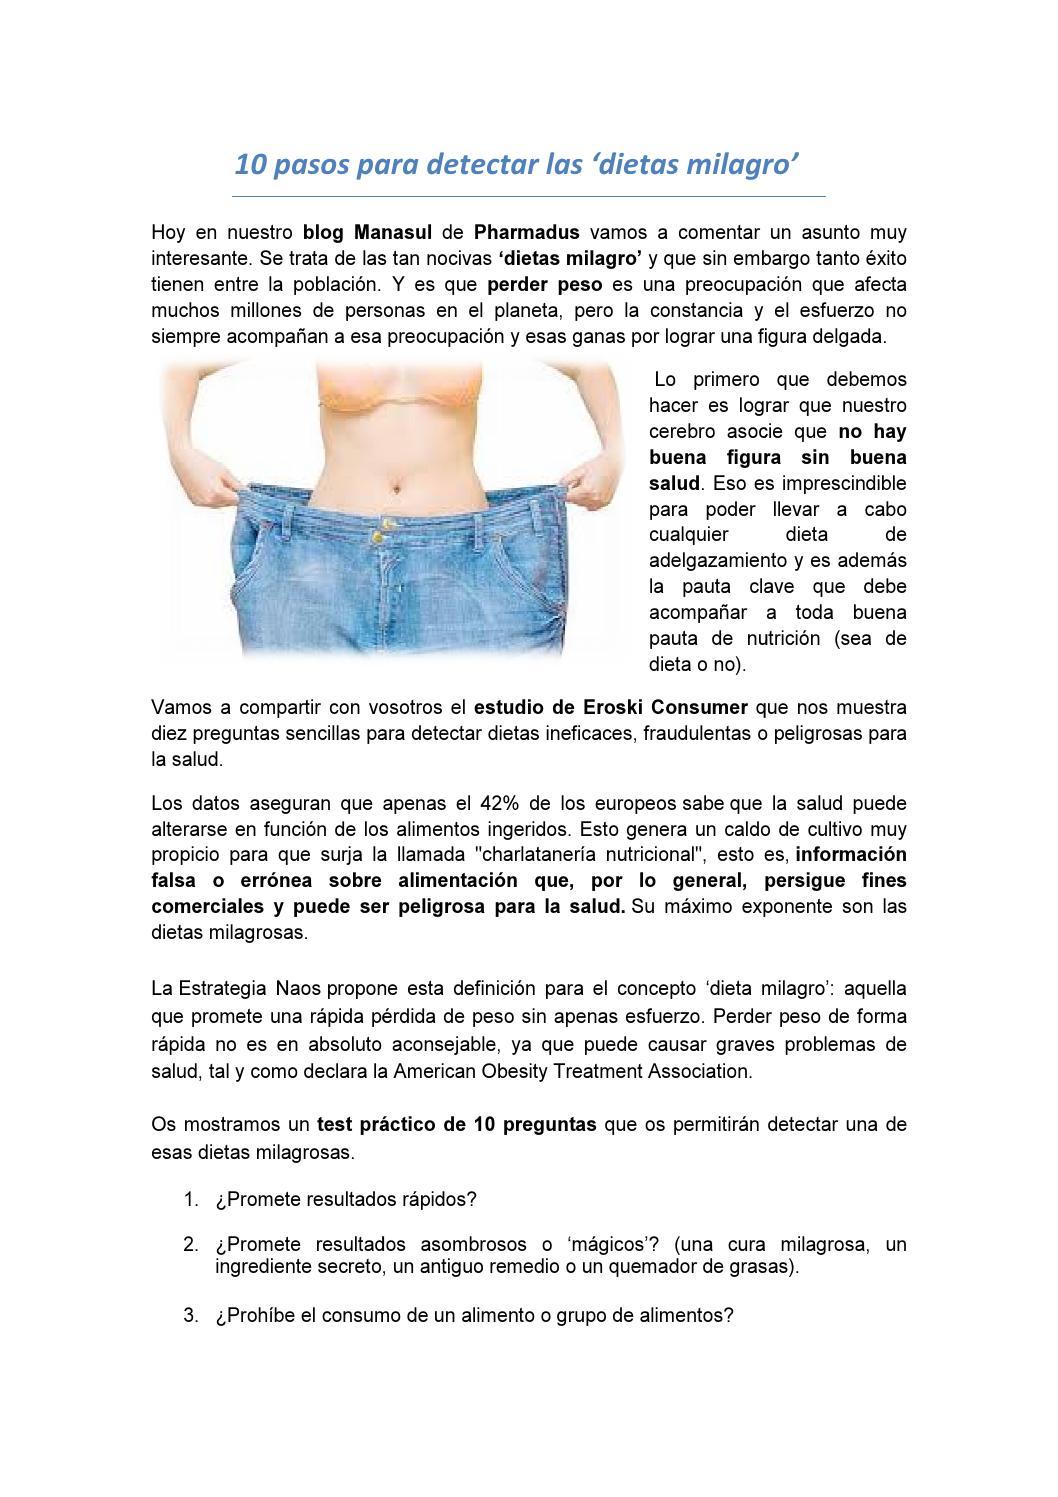 Perder peso sin dietas milagro